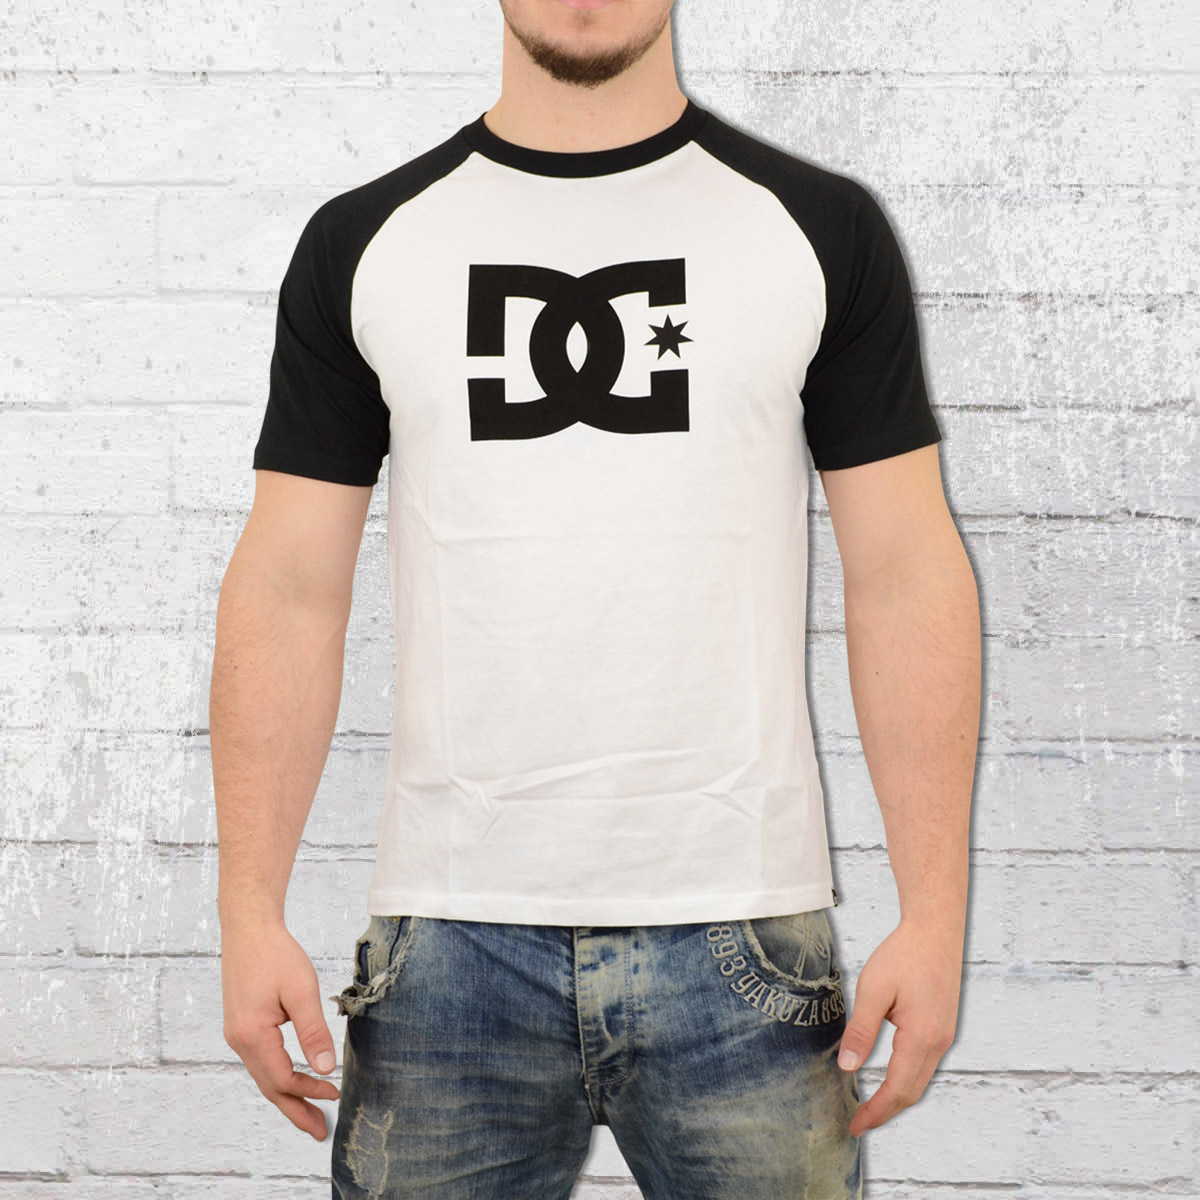 39fab863eaa8 DC Shoes Raglan Star T-Shirt white black. ›‹ «